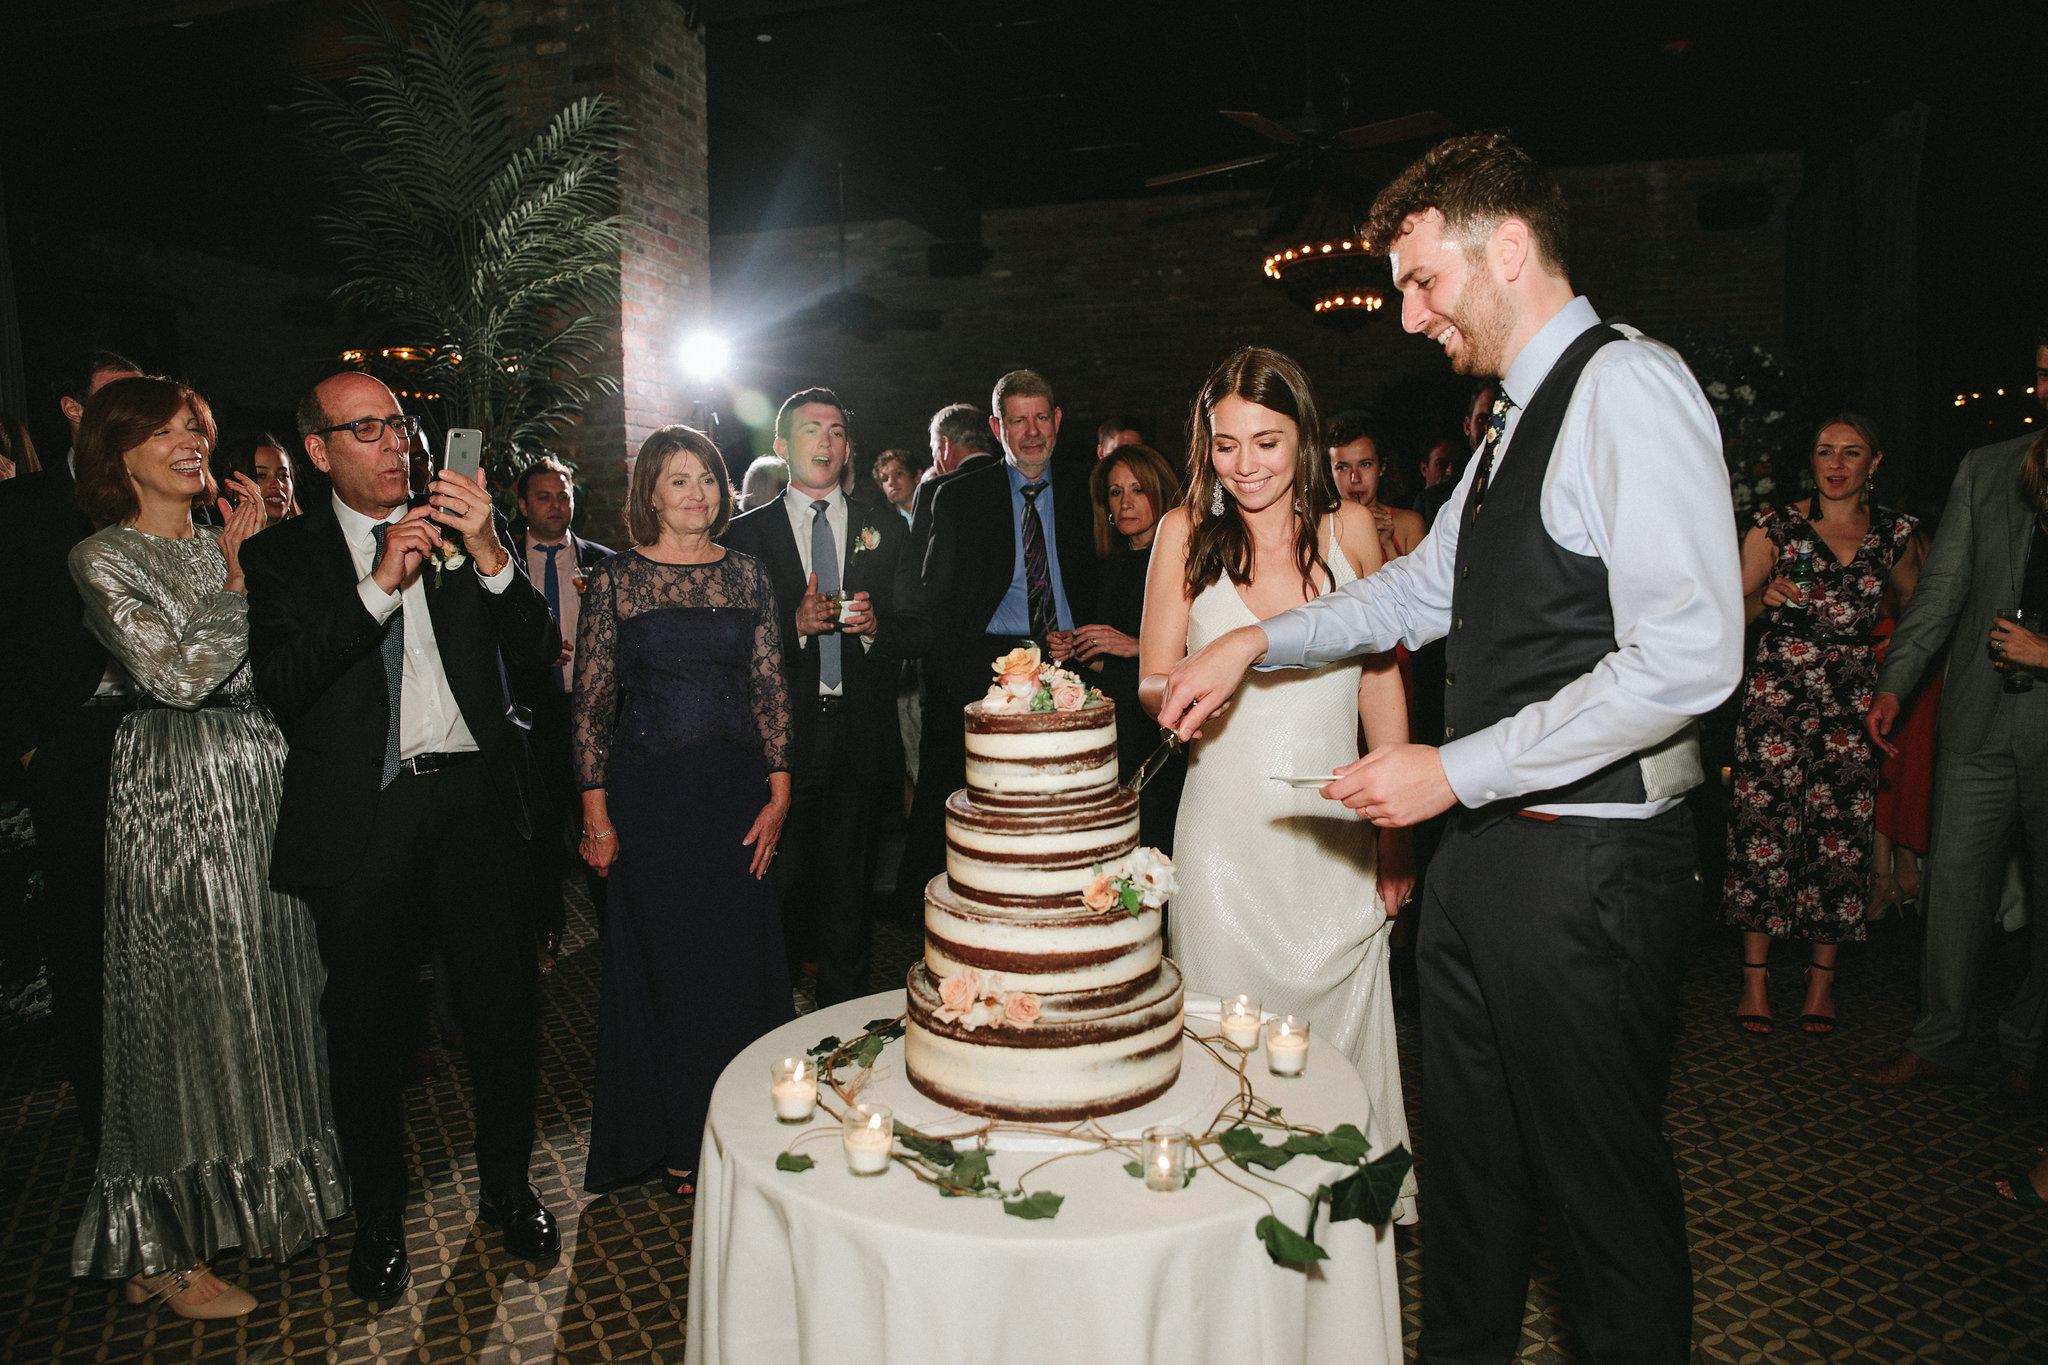 bowery-hotel-wedding-jove-meyer-events-052.jpg